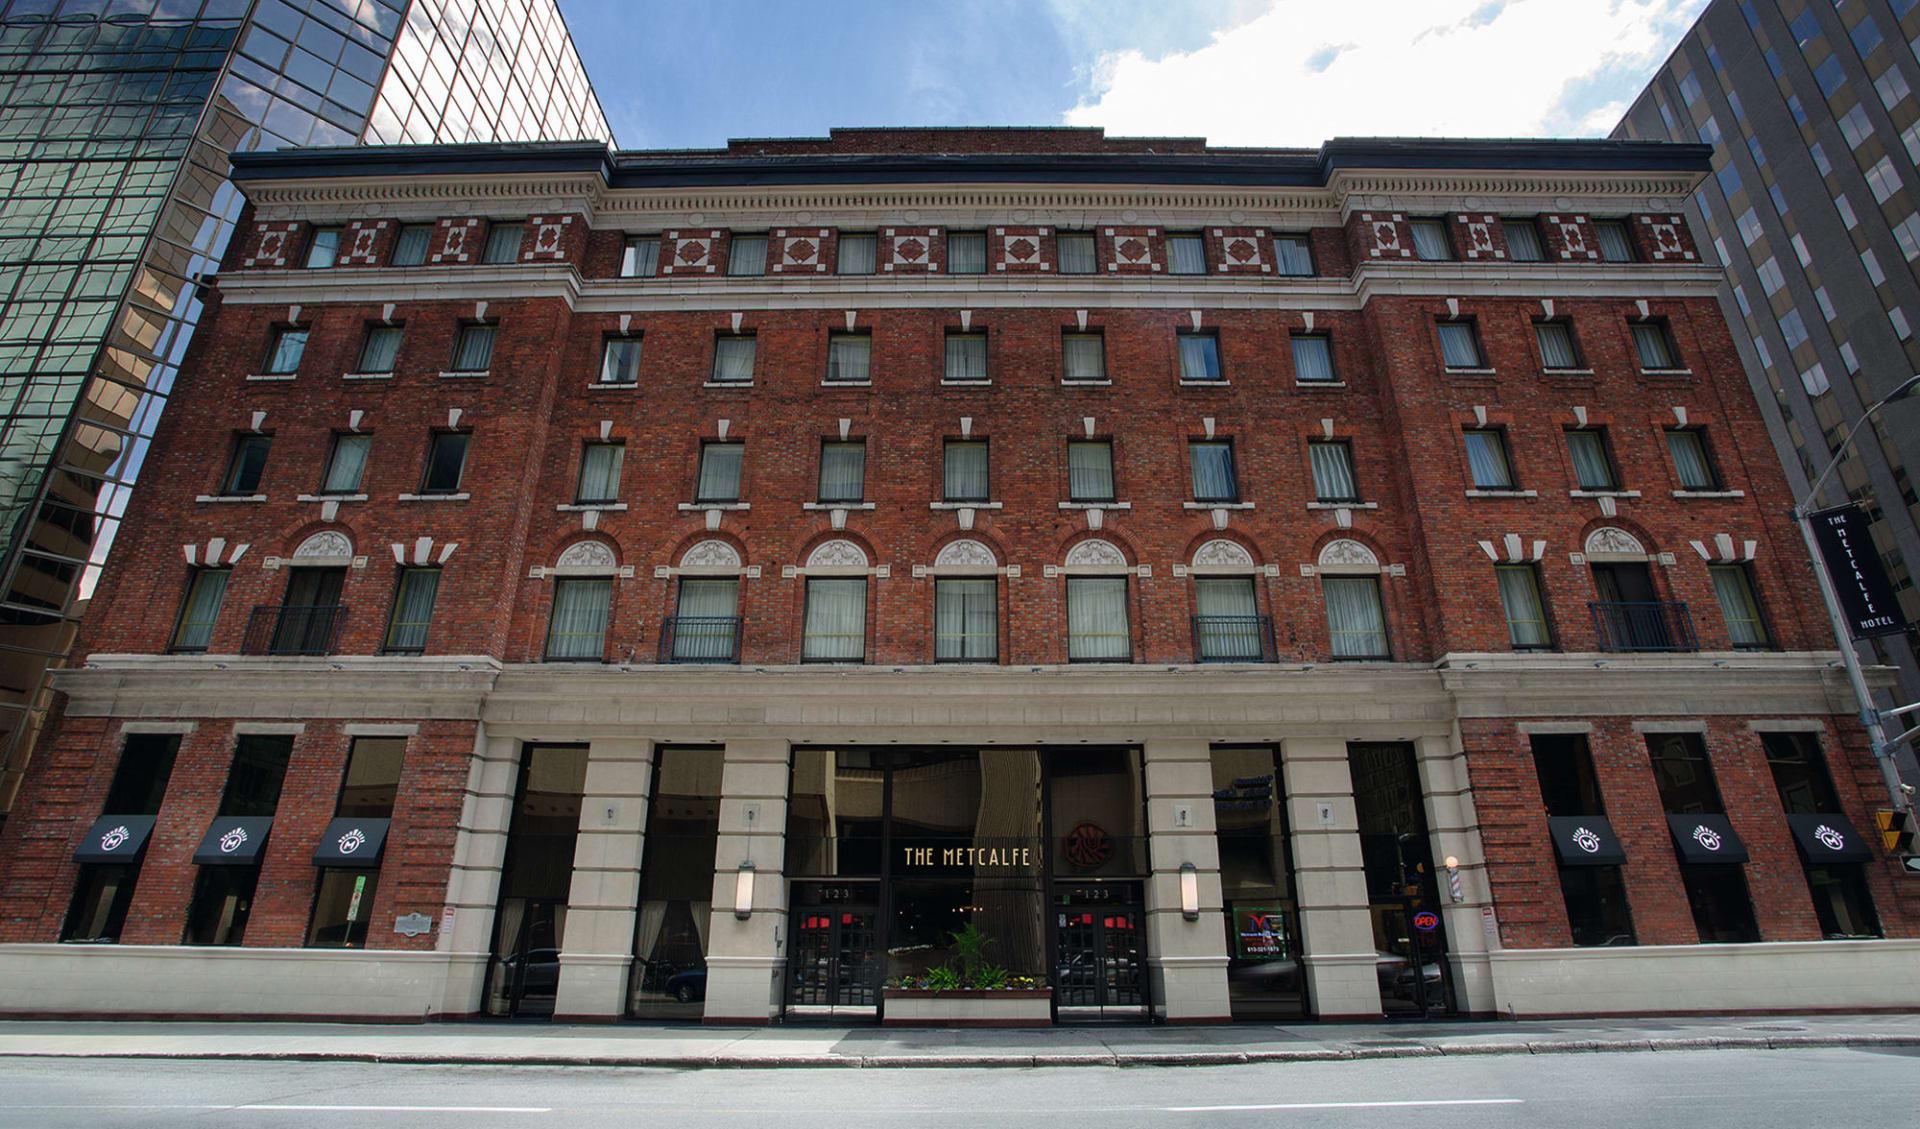 Metcalfe Hotel in Ottawa: exterior_Metcalfe Hotel, Ottawa